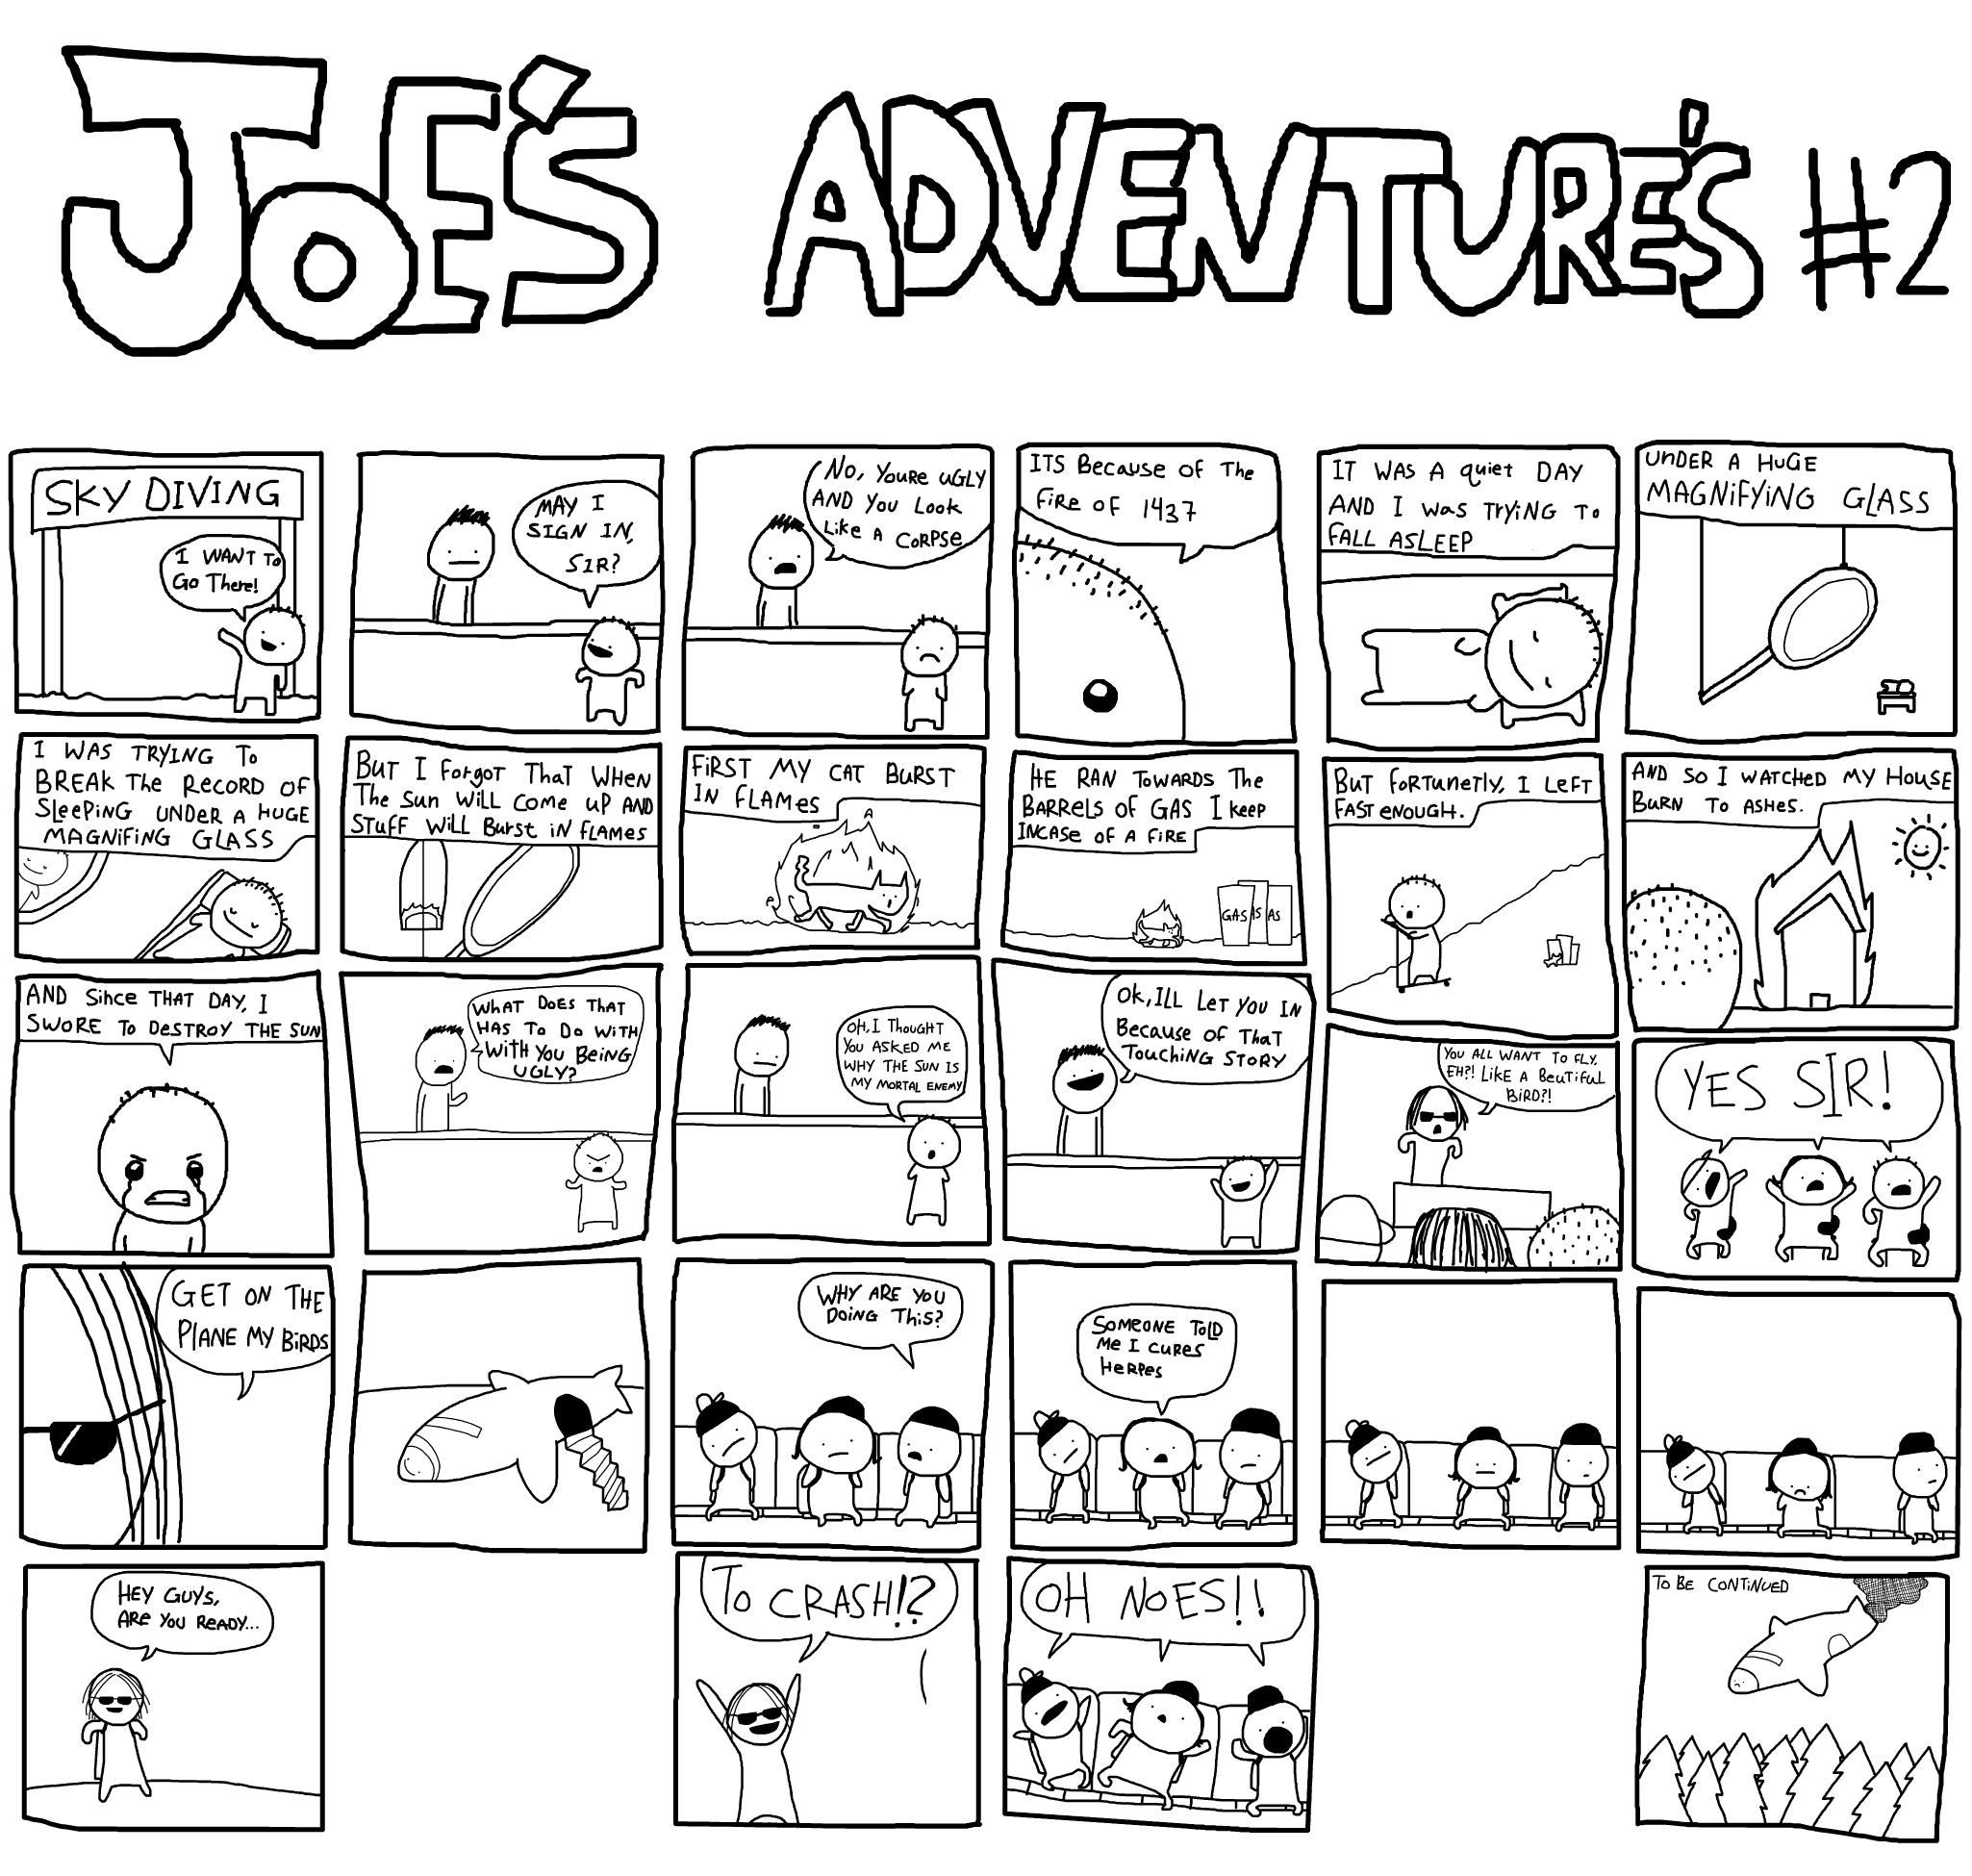 Joes Adventures 2